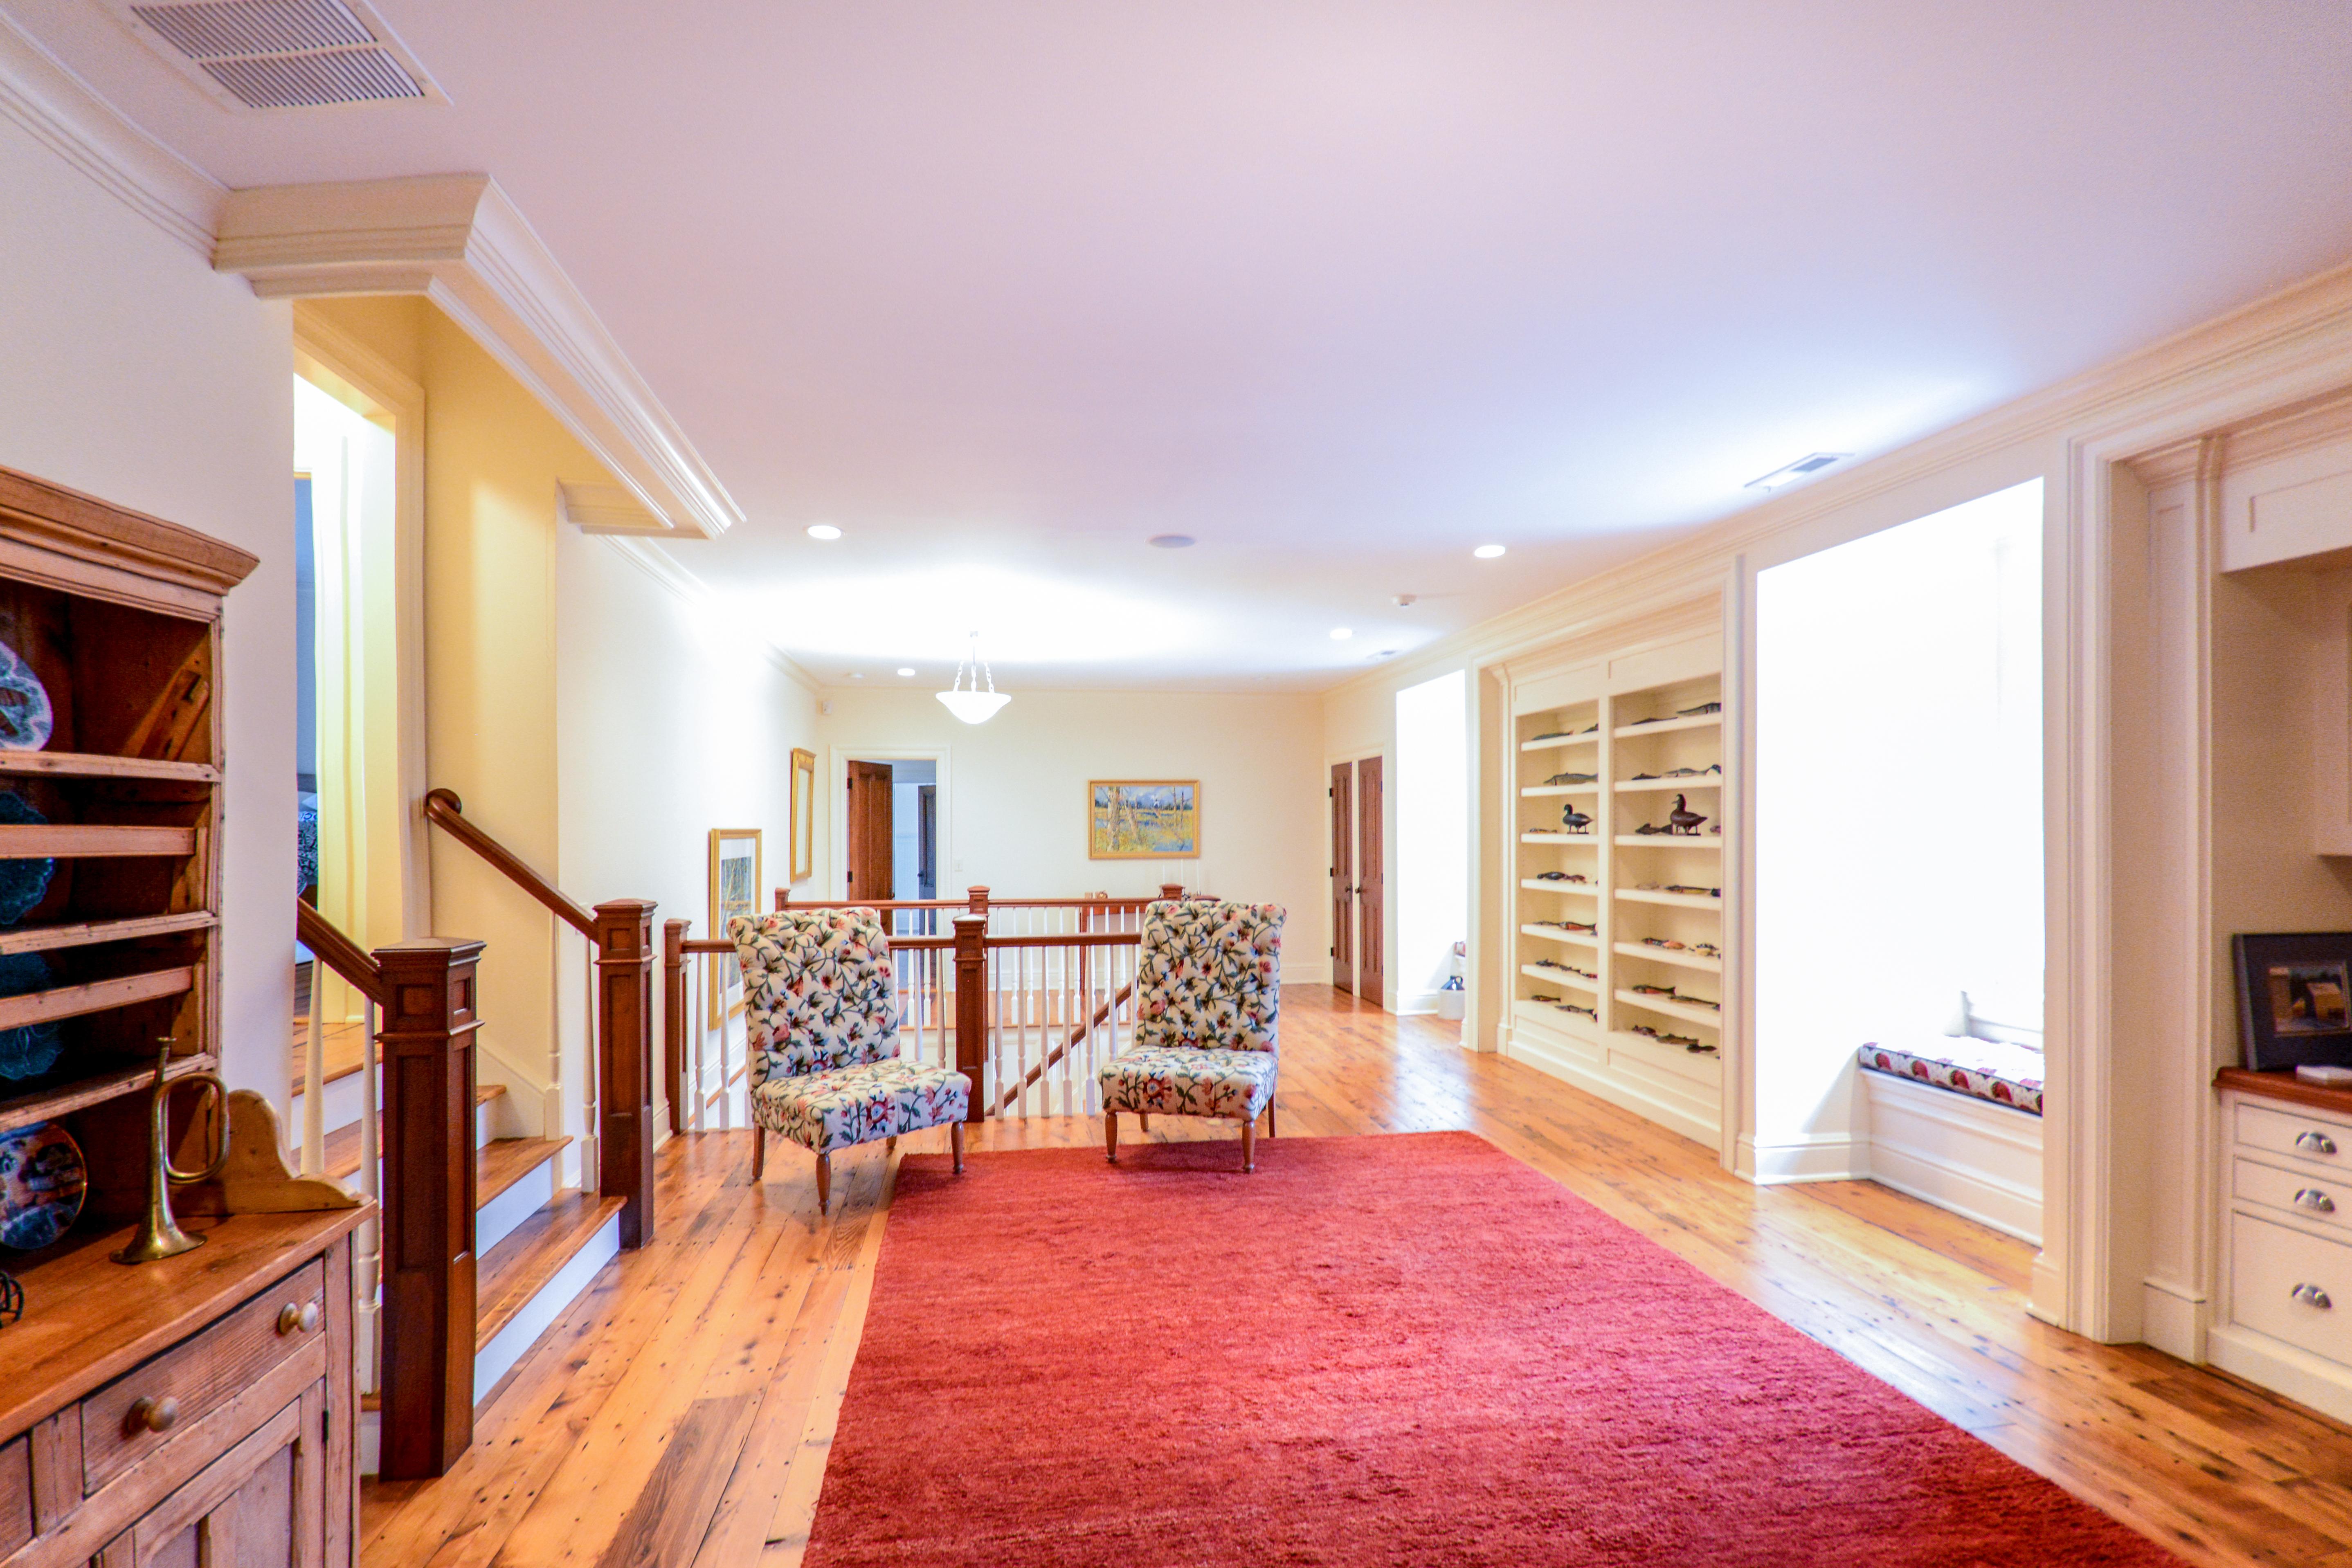 Inra Upstairs Hall Room